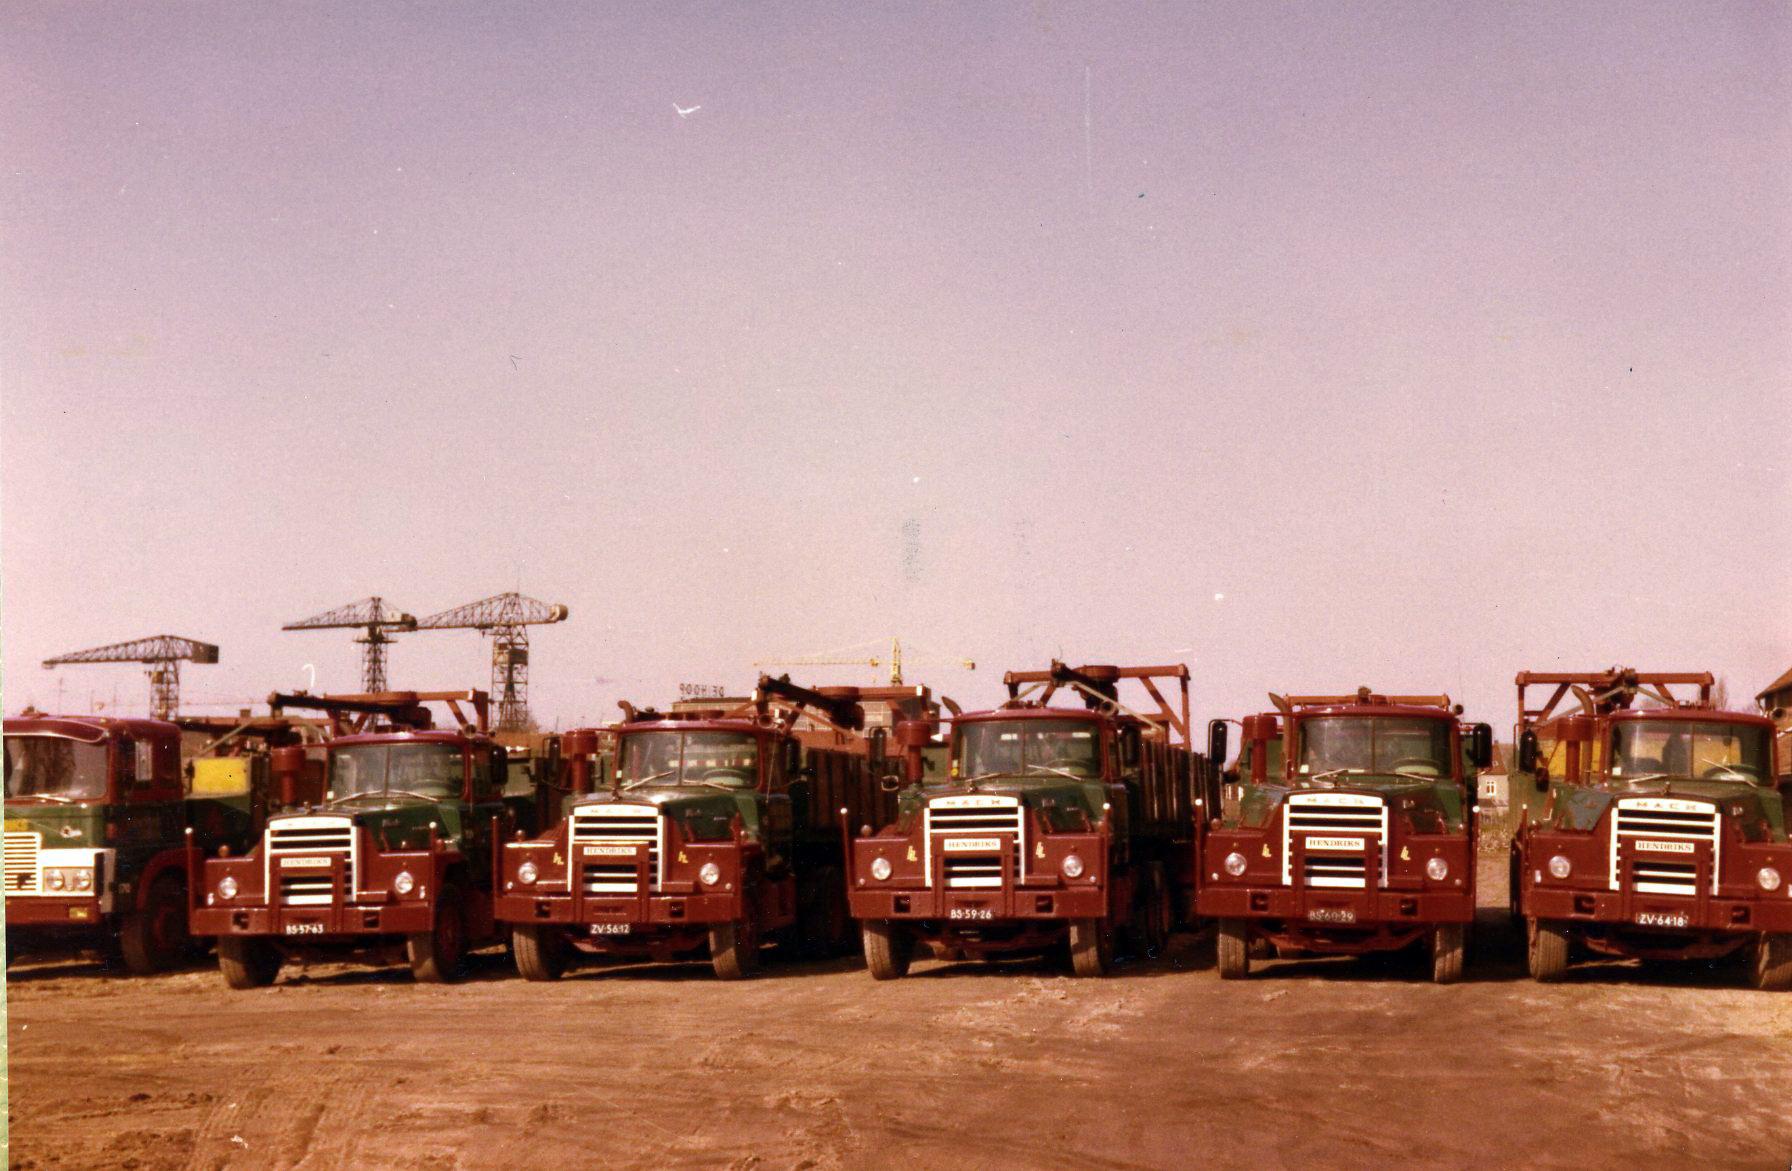 Hendriks-Lobith-5x-Mack-DM609-S